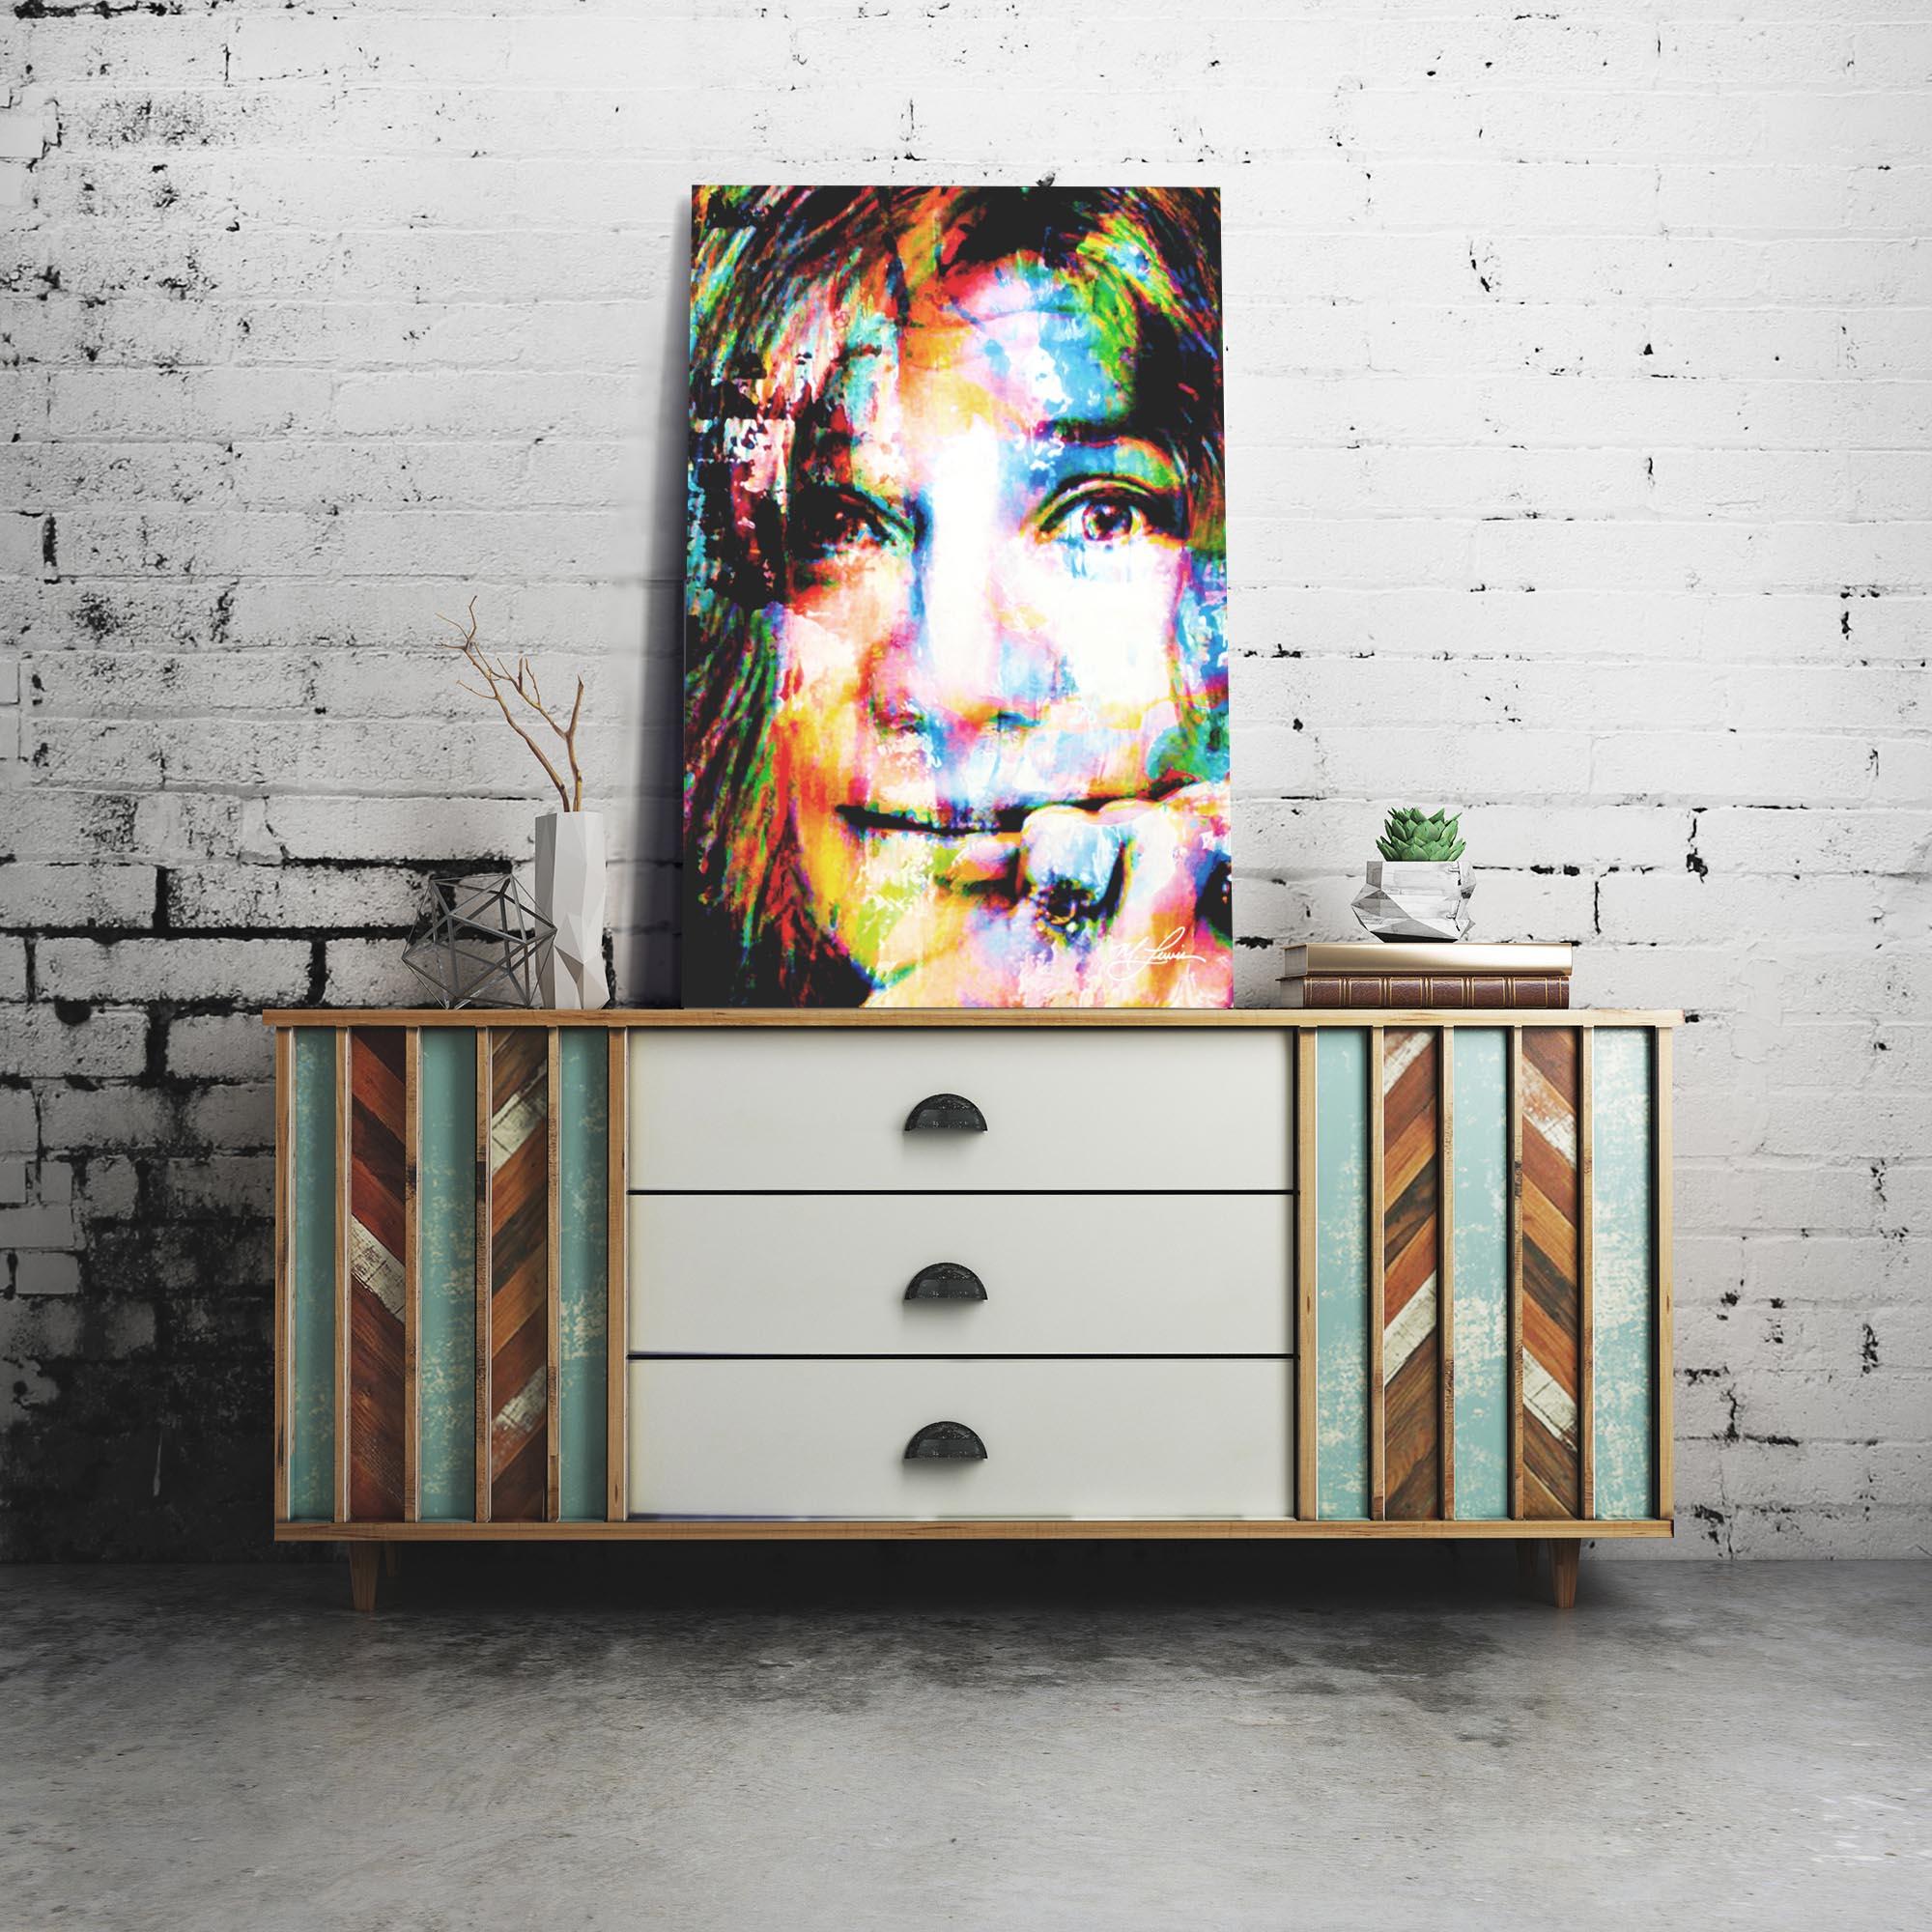 Janis Joplin Declaration of Soul 22x32 Metal or Plexiglass Pop Art Portrait - Lifestyle View